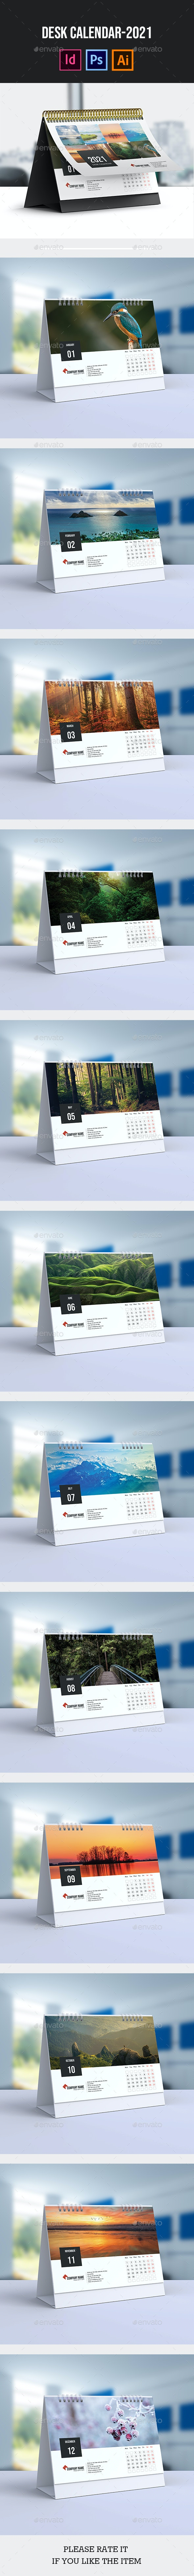 Desk Calendar for 2021 | Updated - Calendars Stationery